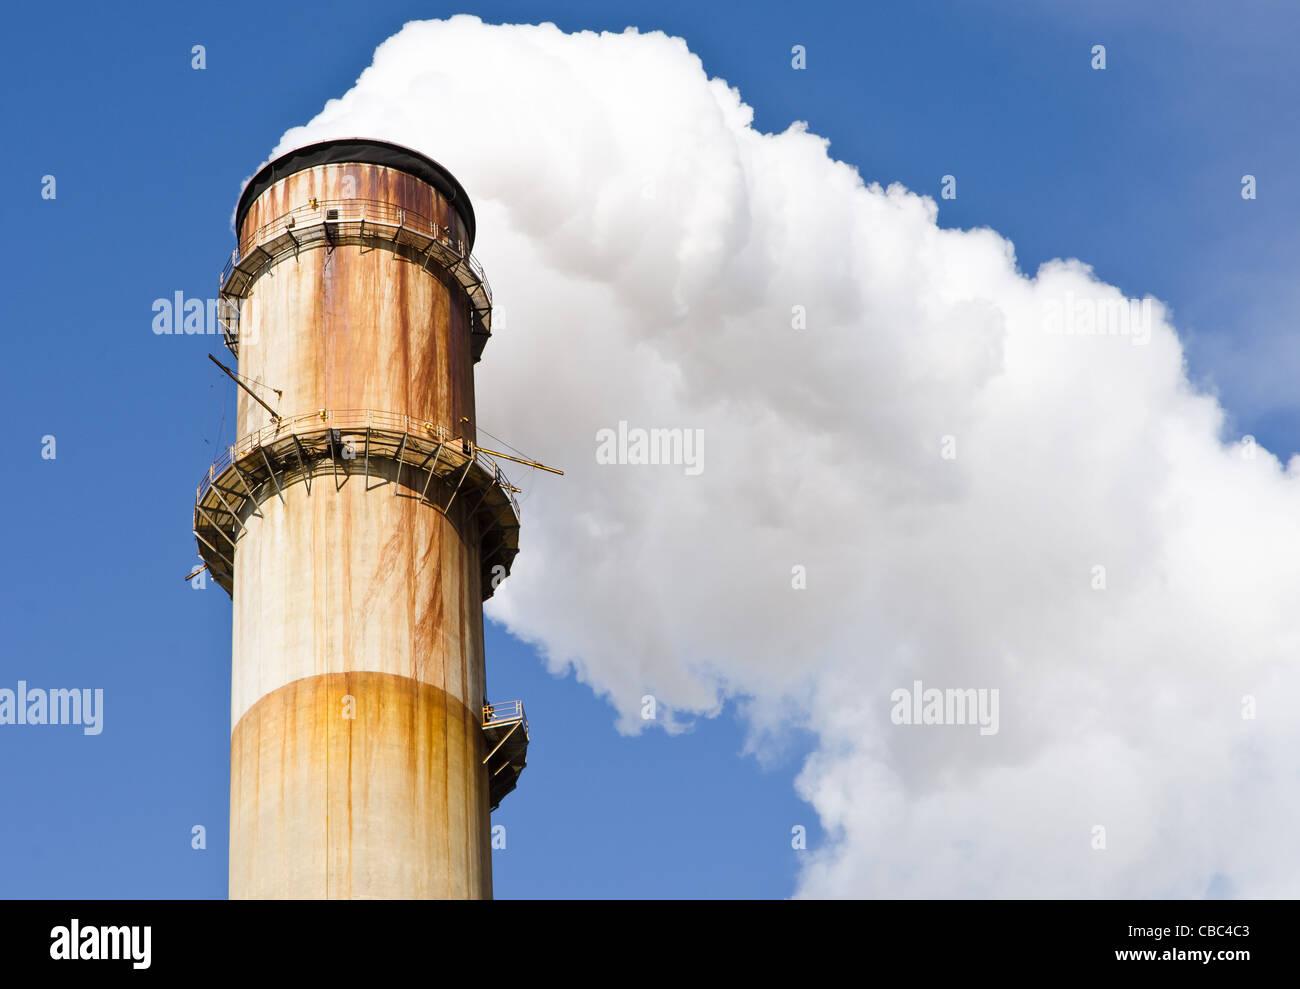 Big Bend Power Station,  Tampa Electric Company, TECO - Stock Image